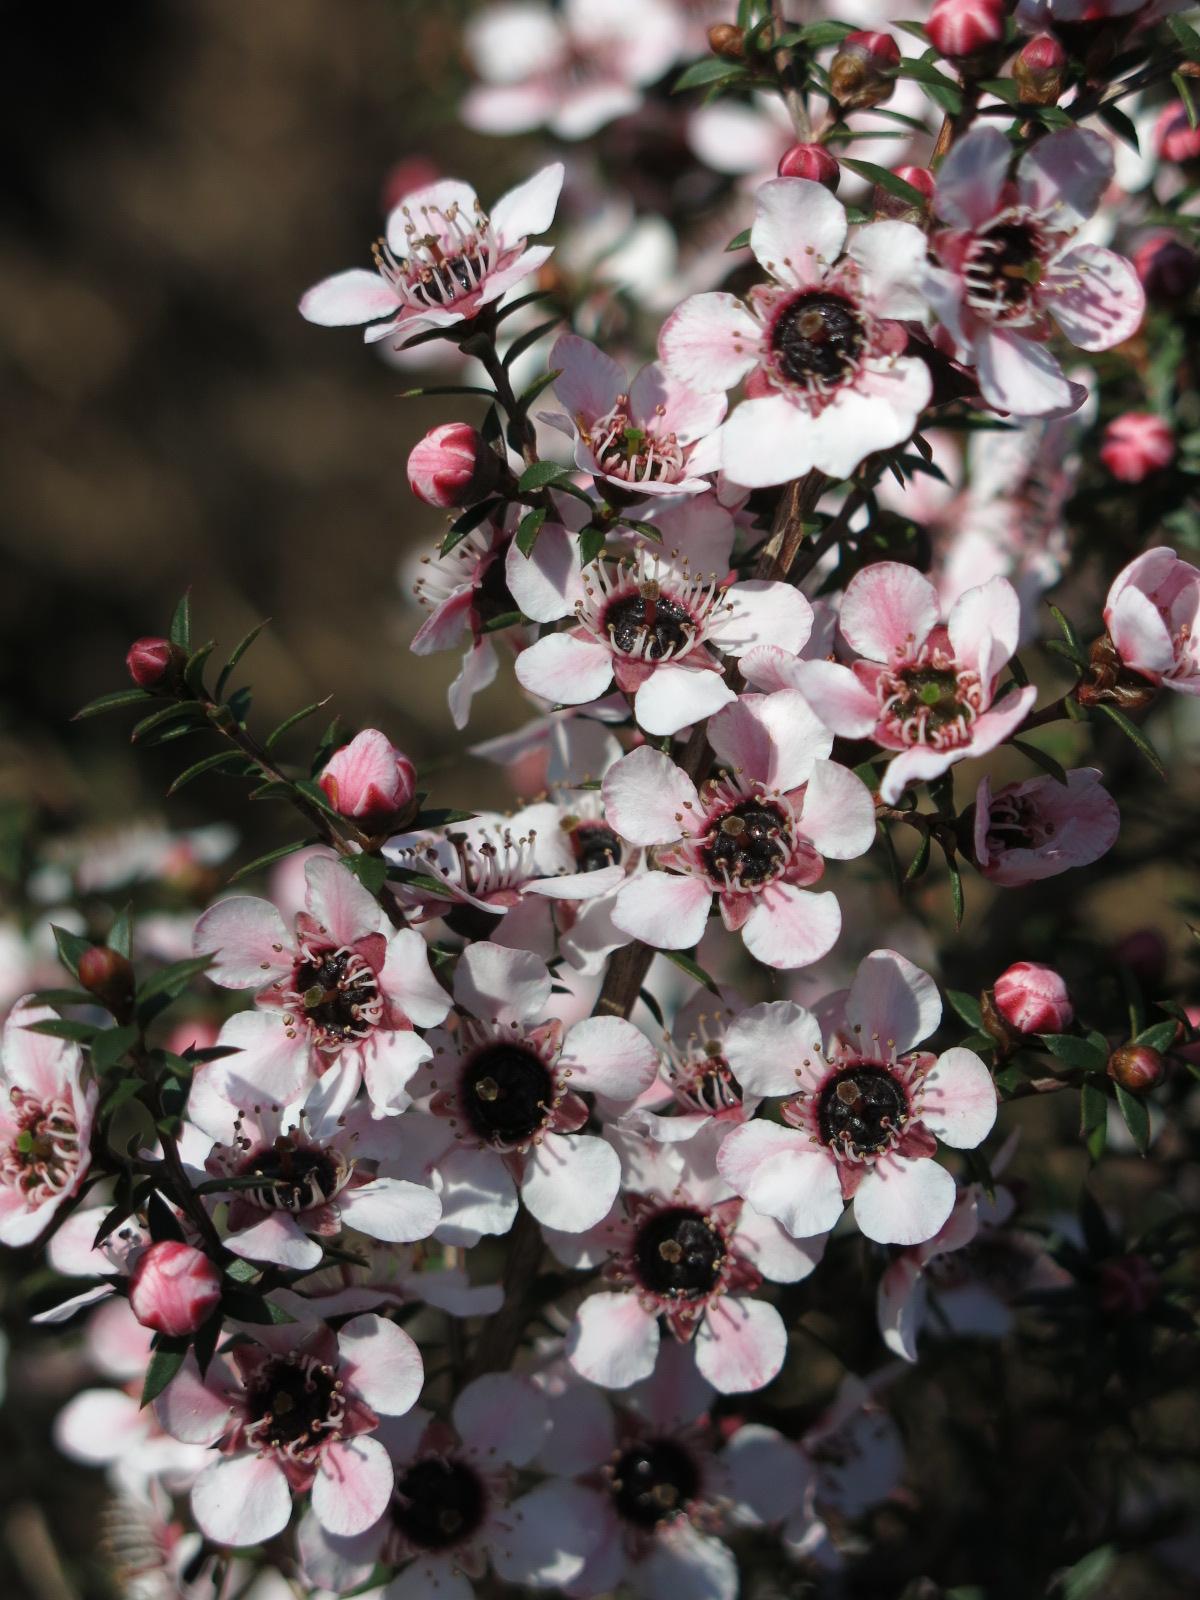 Manuka Flower マヌカの花